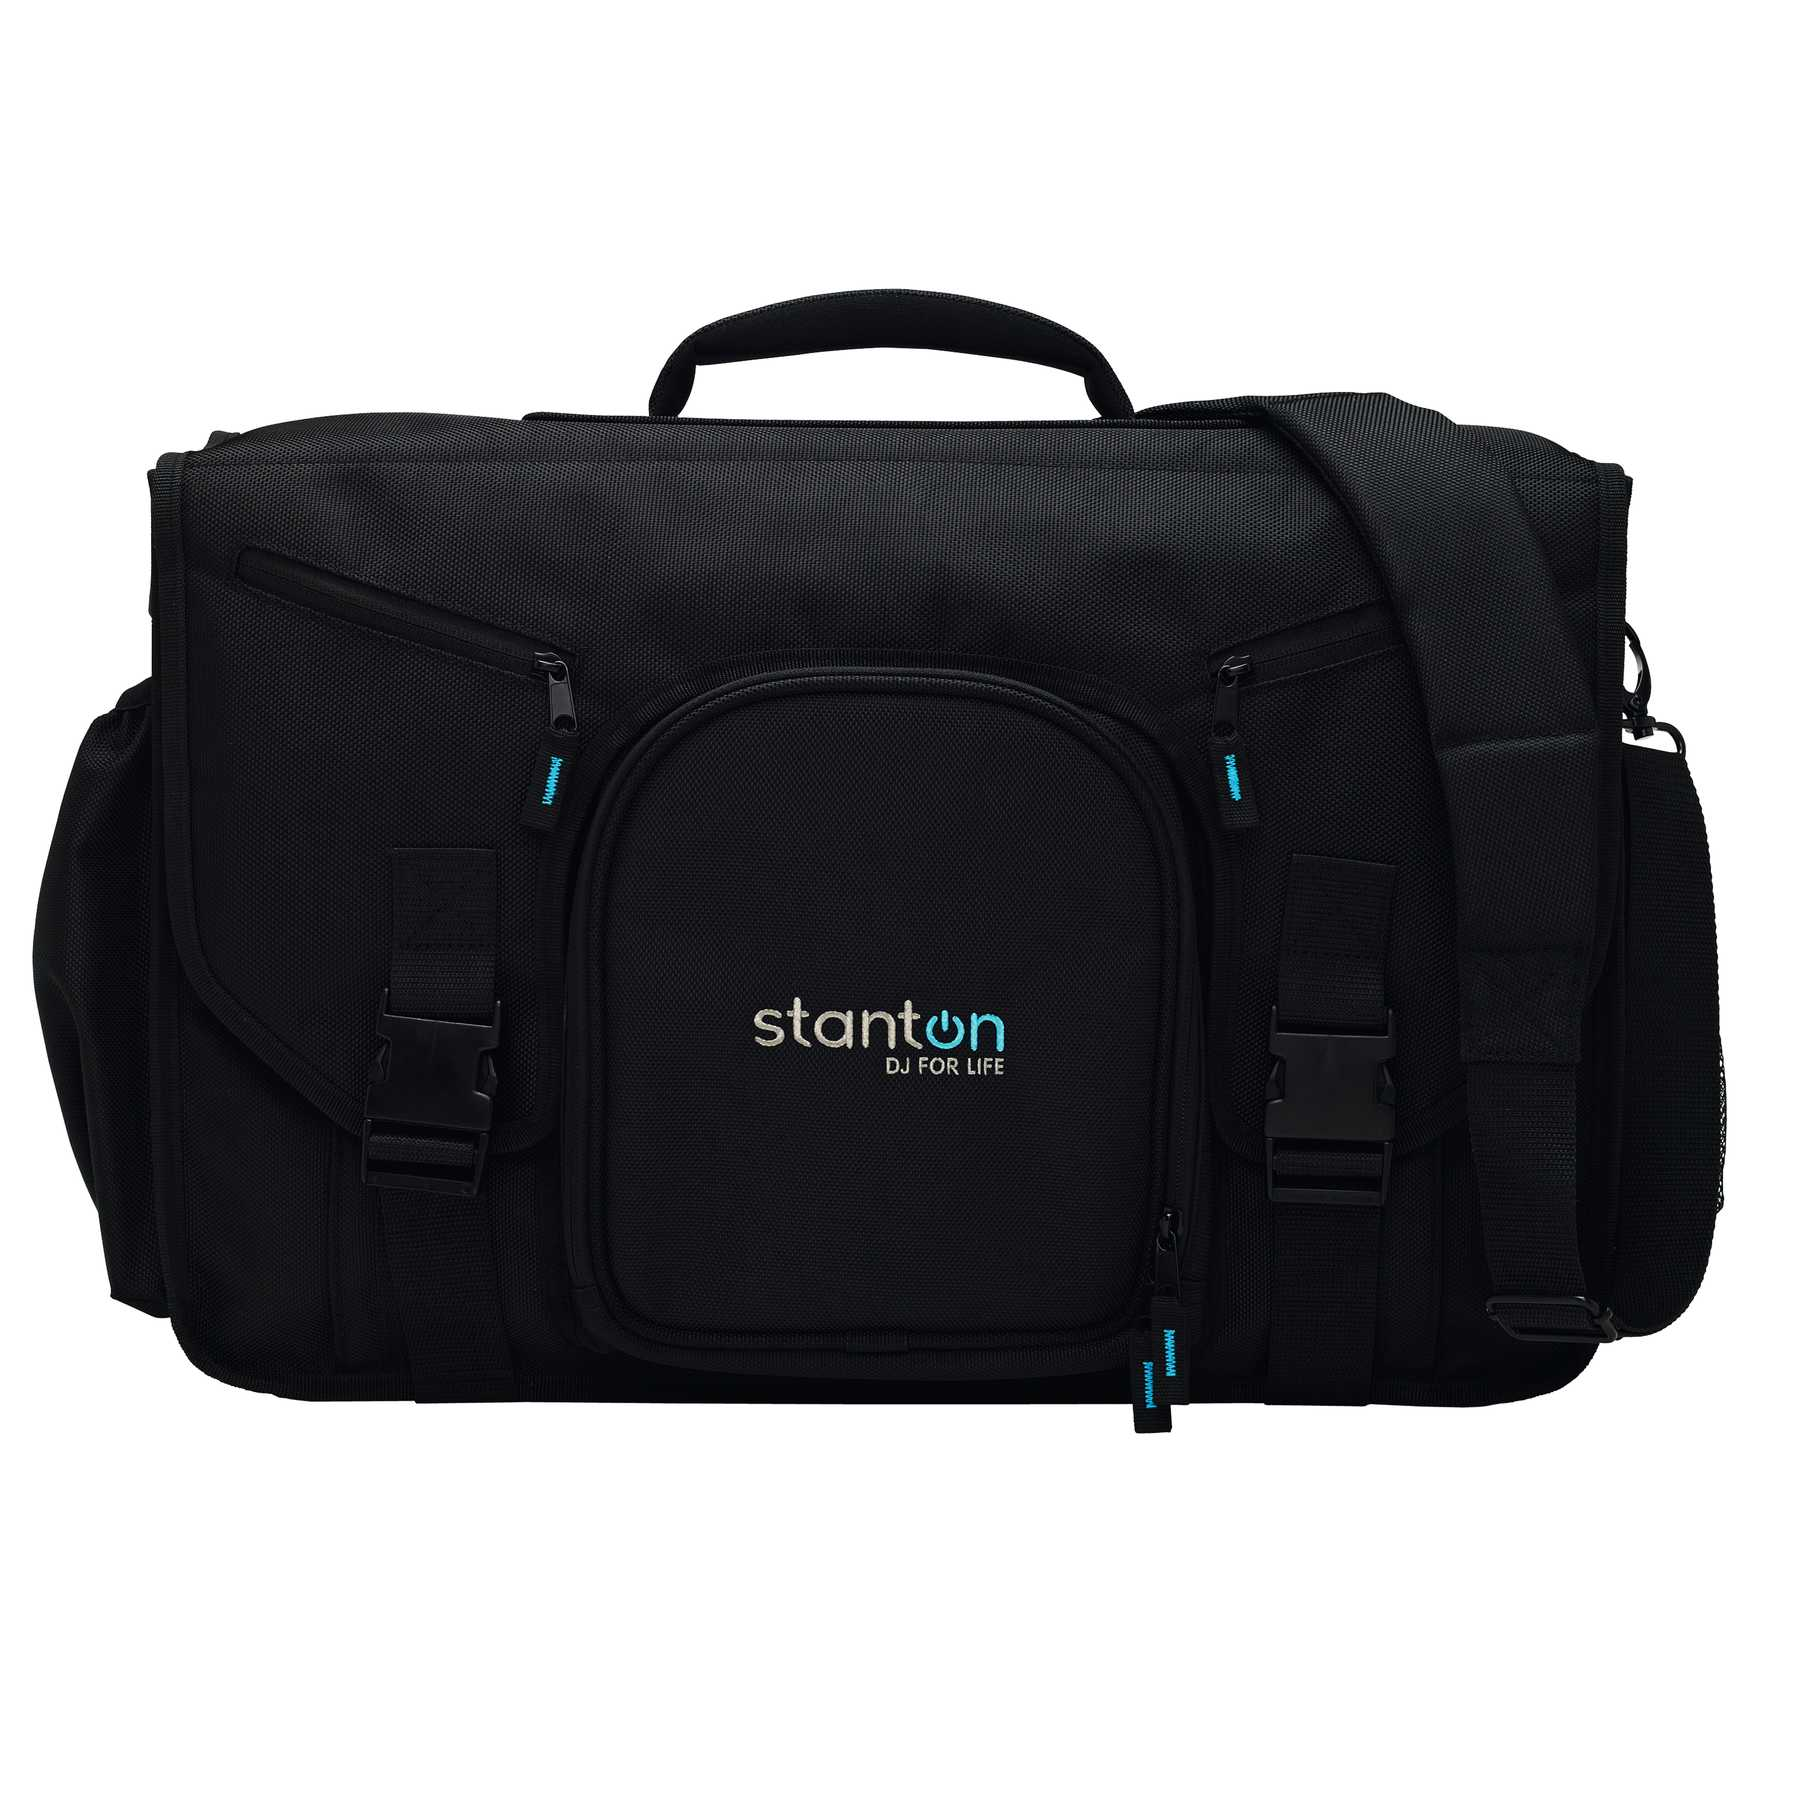 Stanton SCS-4 Bag 225325